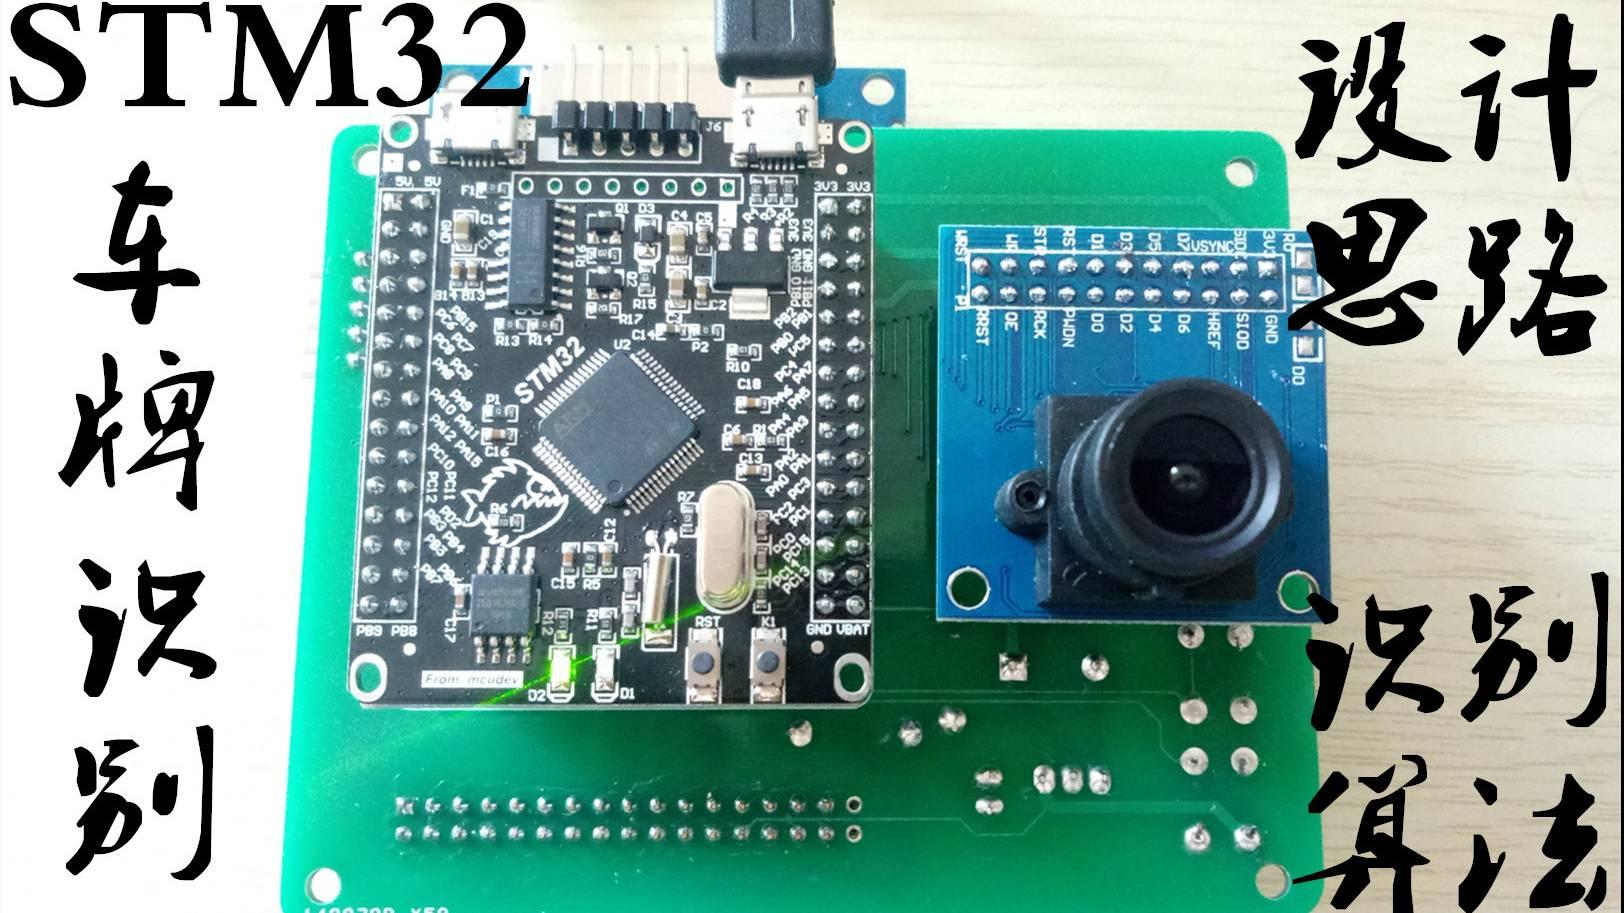 STM32单片机车牌识别算法